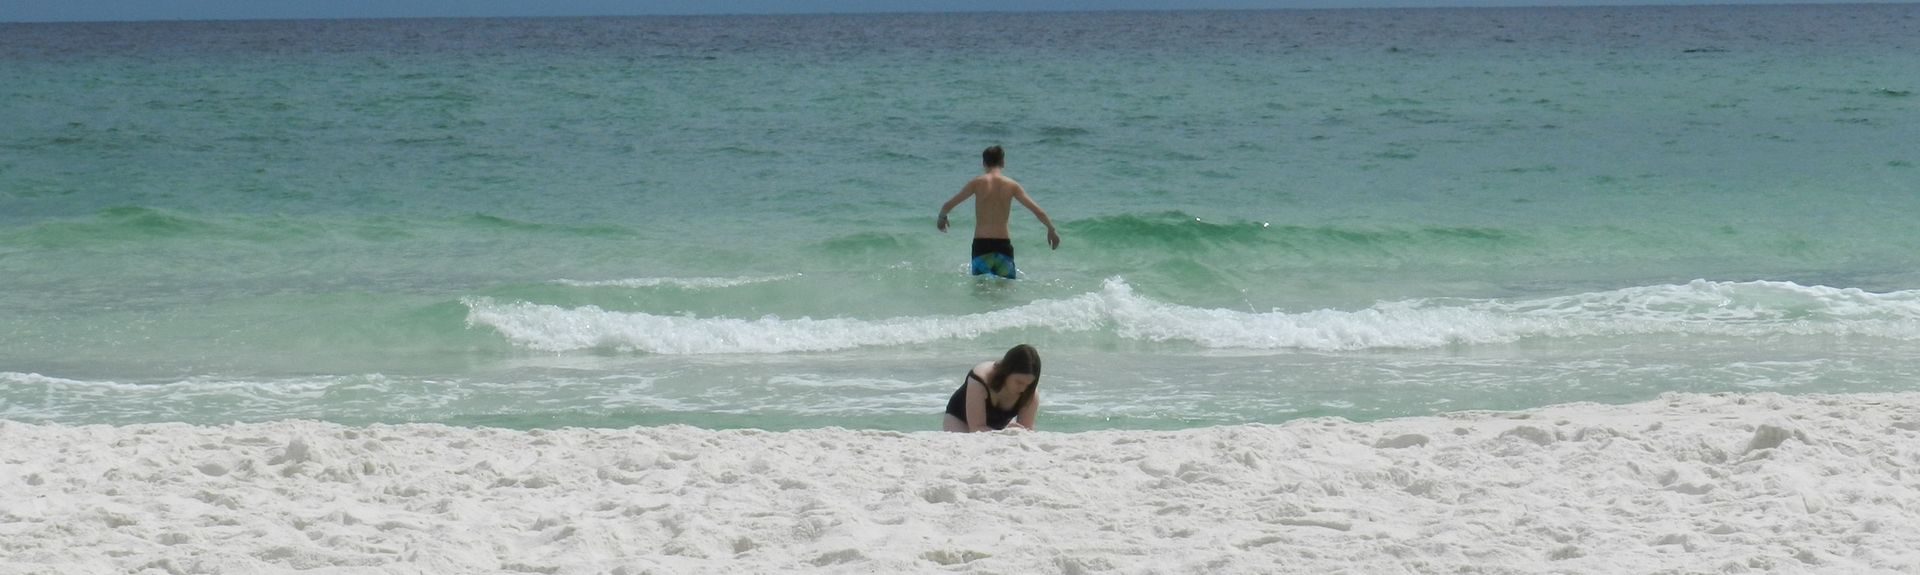 Aquavista, Panama City Beach, FL, USA